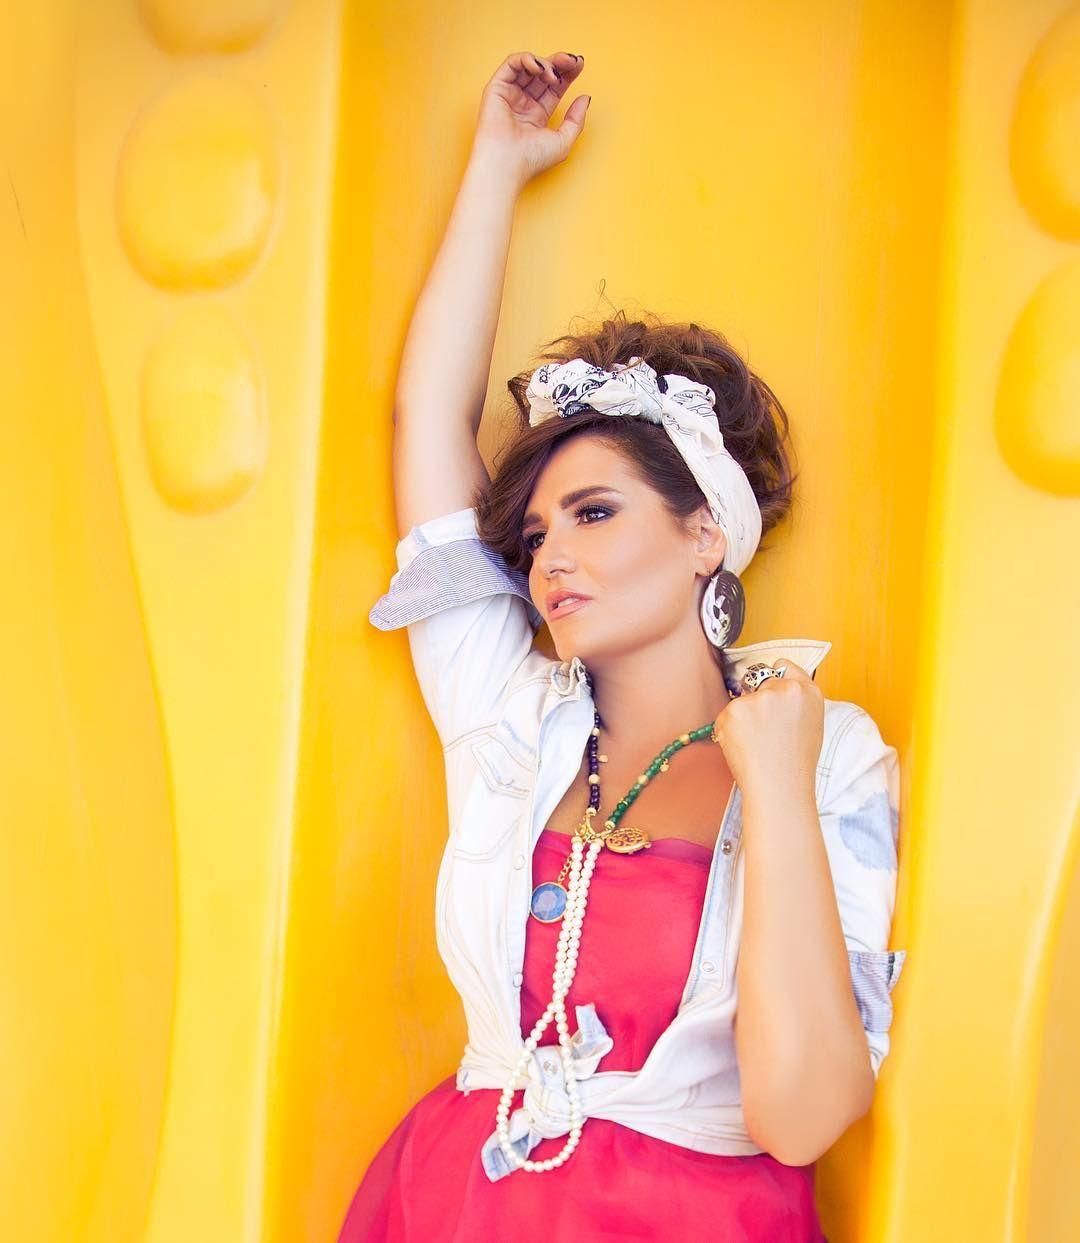 HANA SHIHA - MAD Celebrity